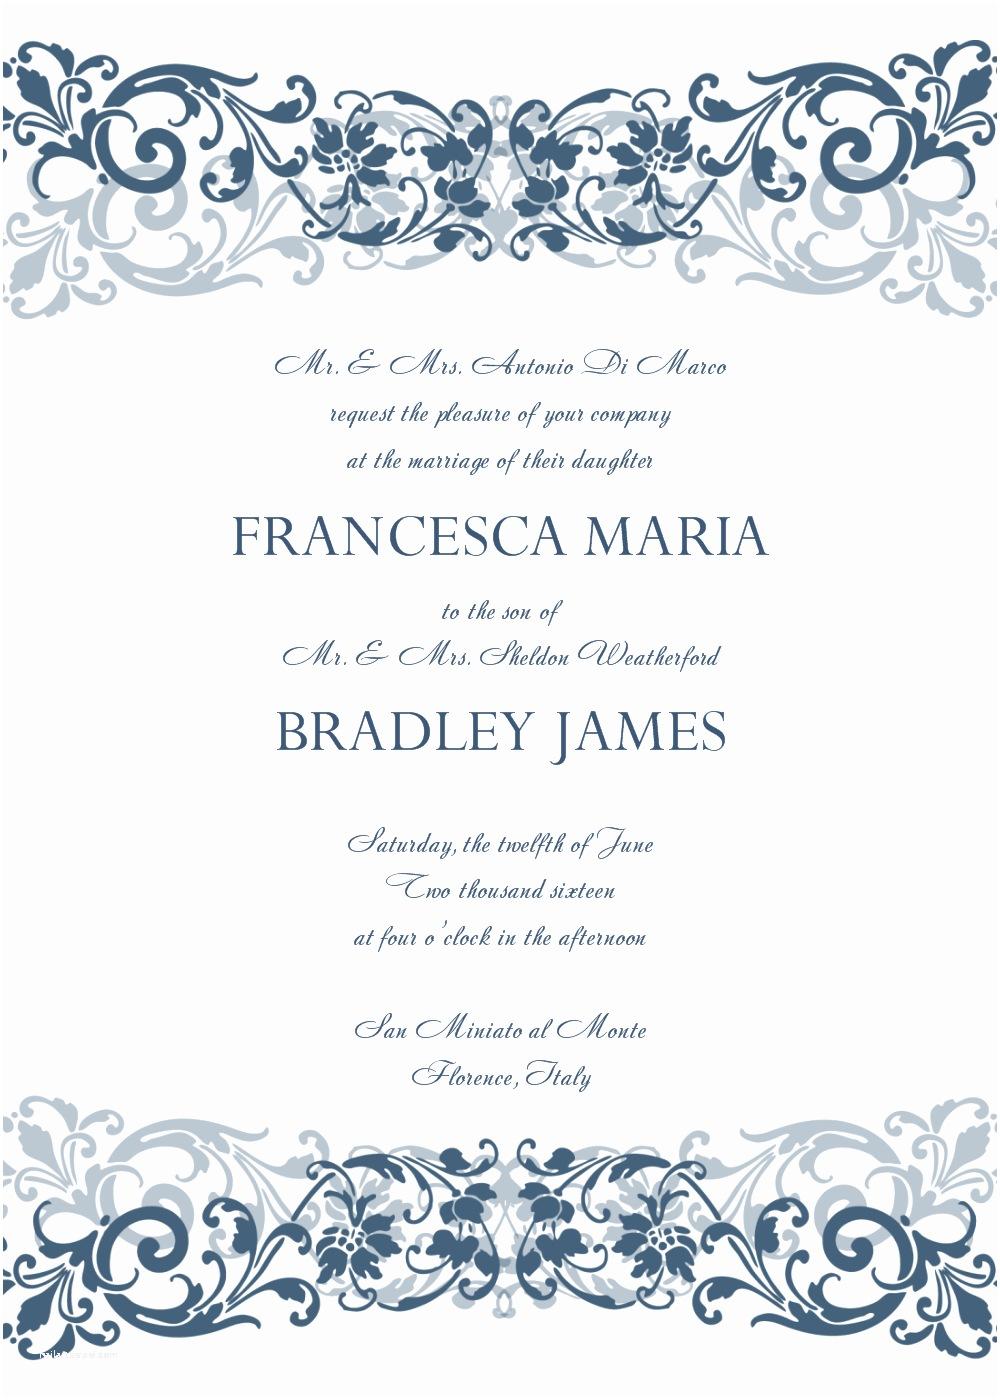 Free Wedding Invitation Samples Free Wedding Design Invitation Template